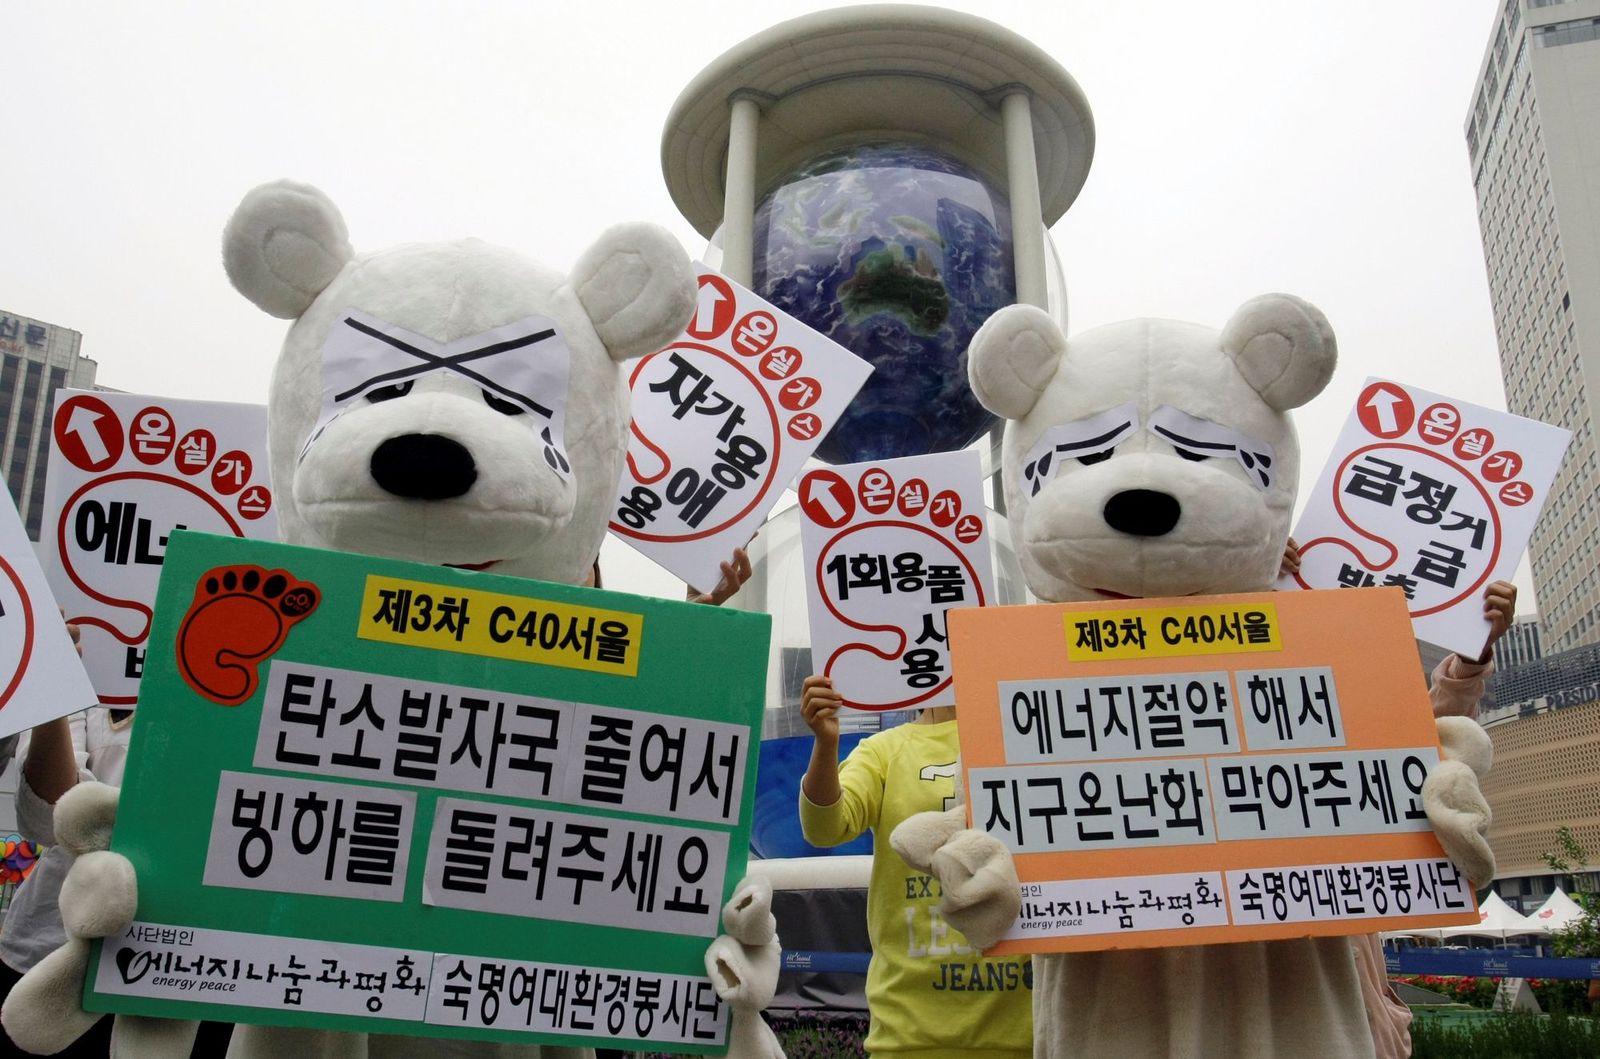 South Korea Climate Change Expo